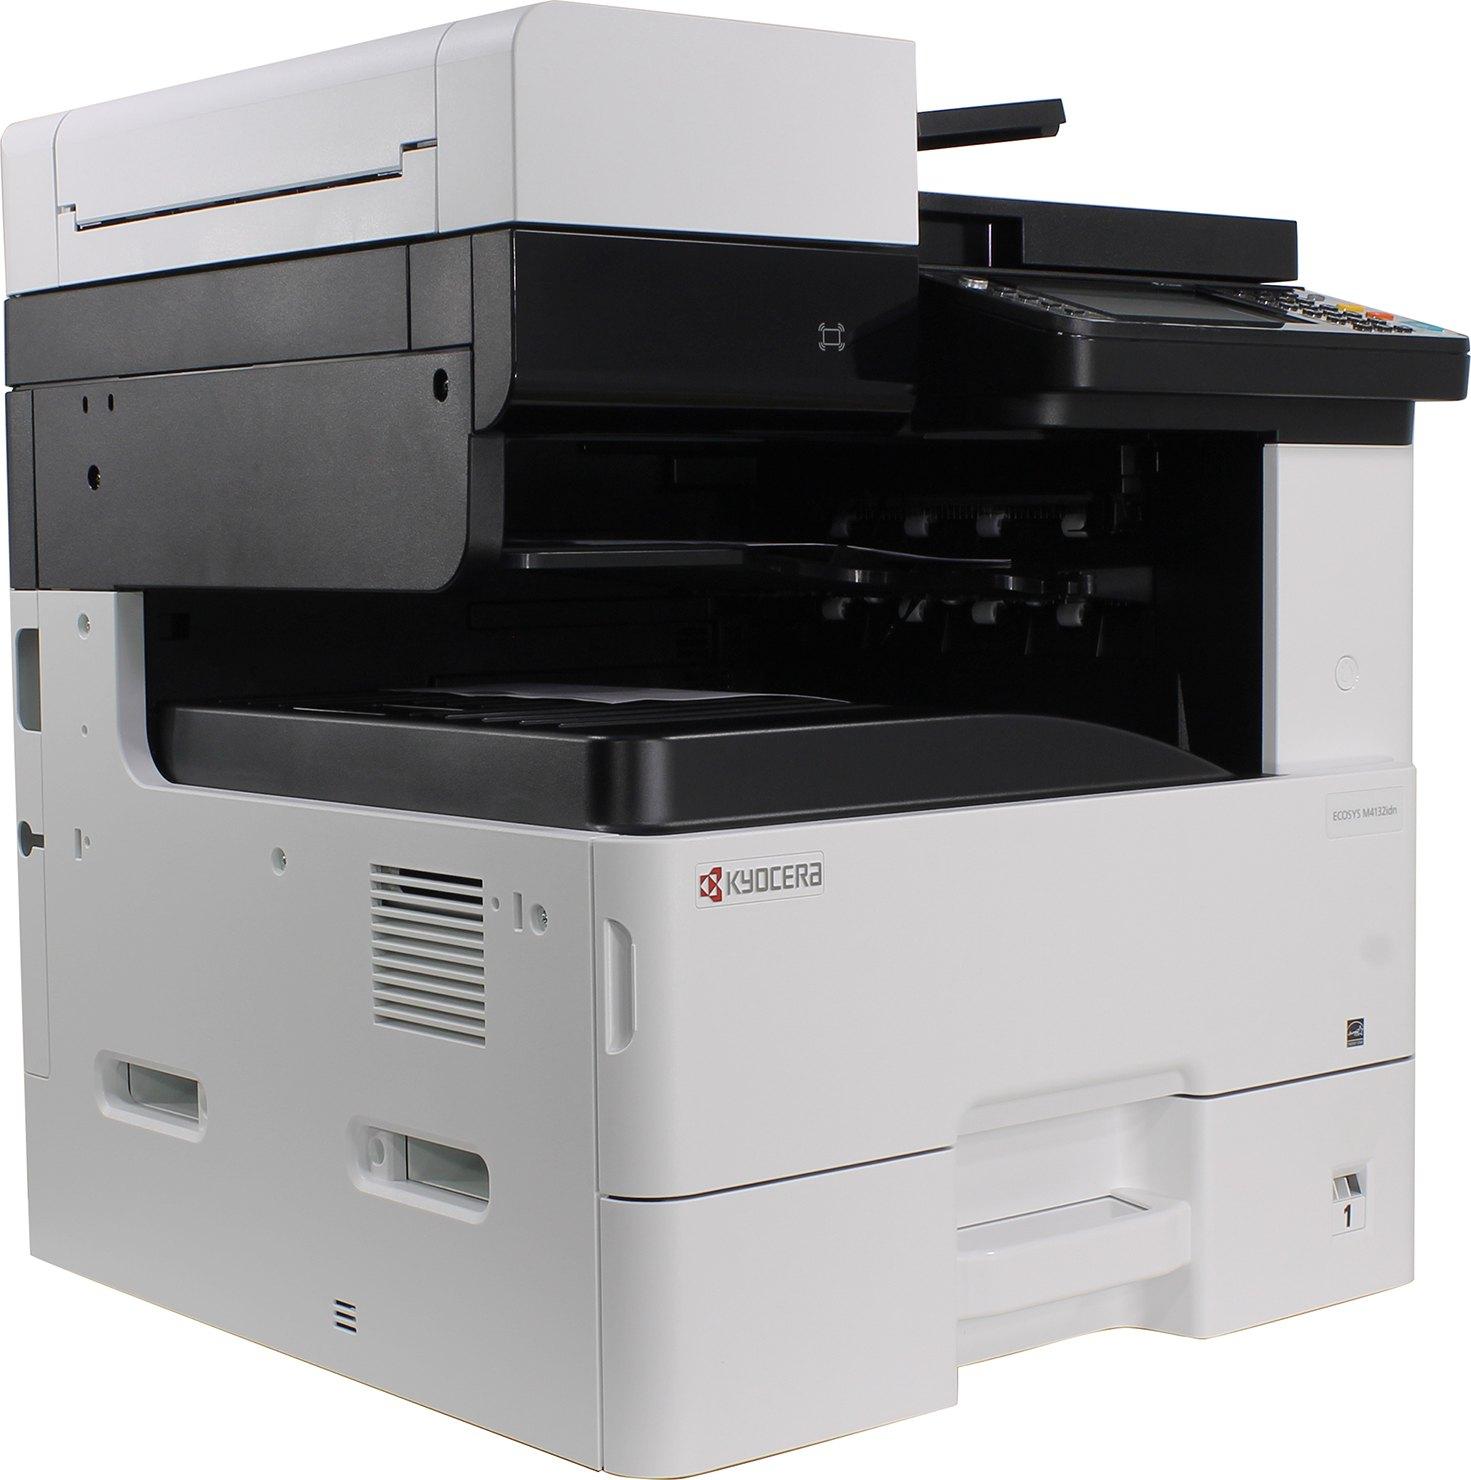 Лазерное МФУ Kyocera M4132idn White, 1102P13NL0  - купить со скидкой